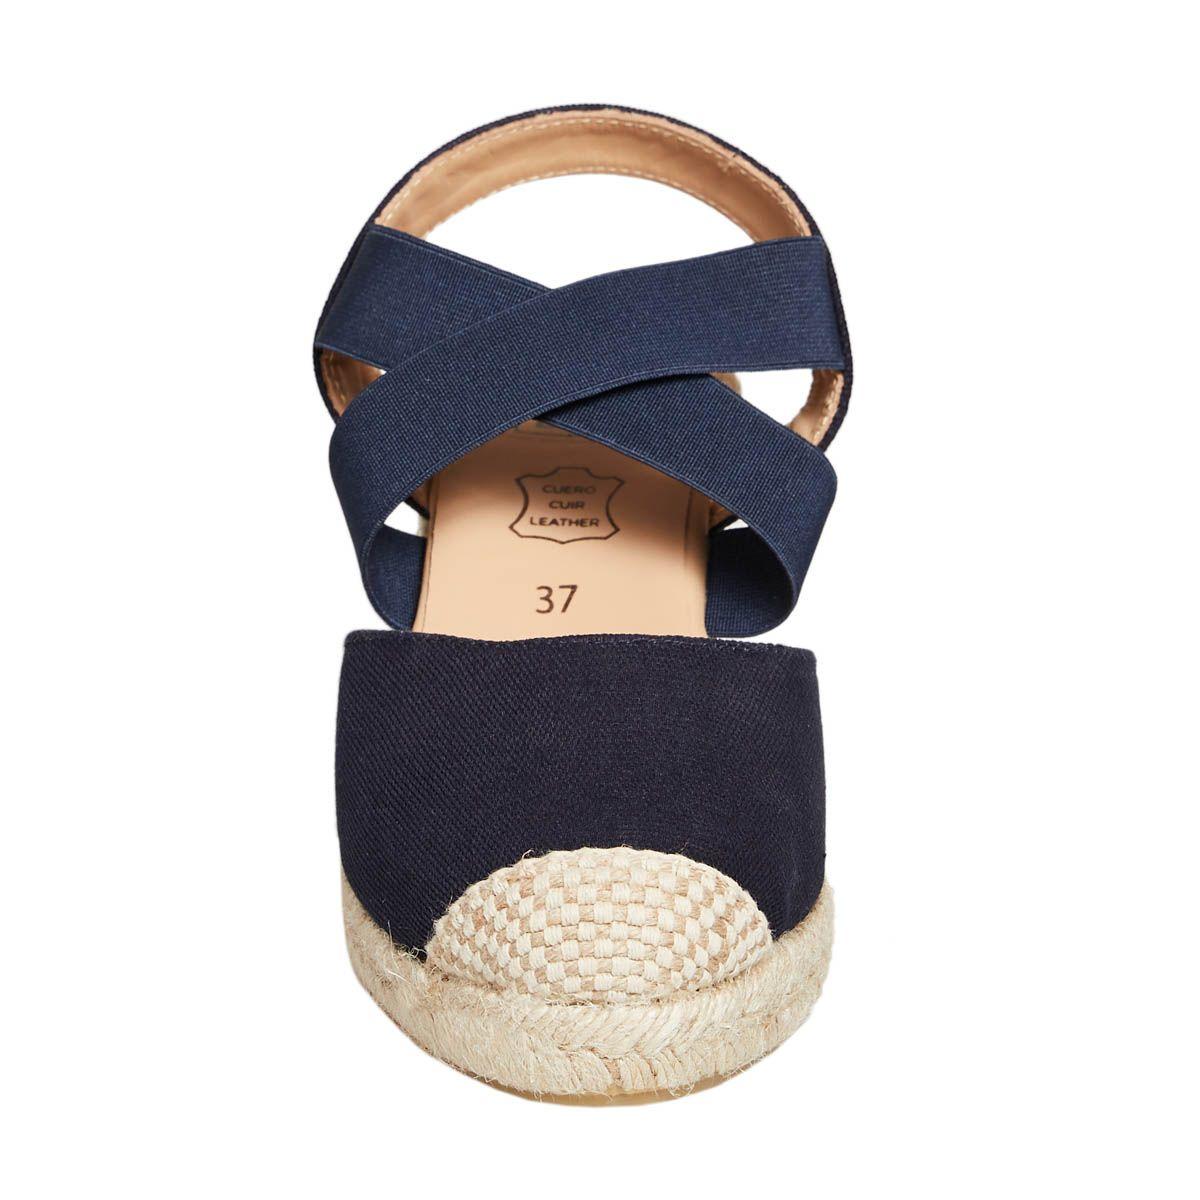 Leindia Sparto Wedge Sandal in Blue